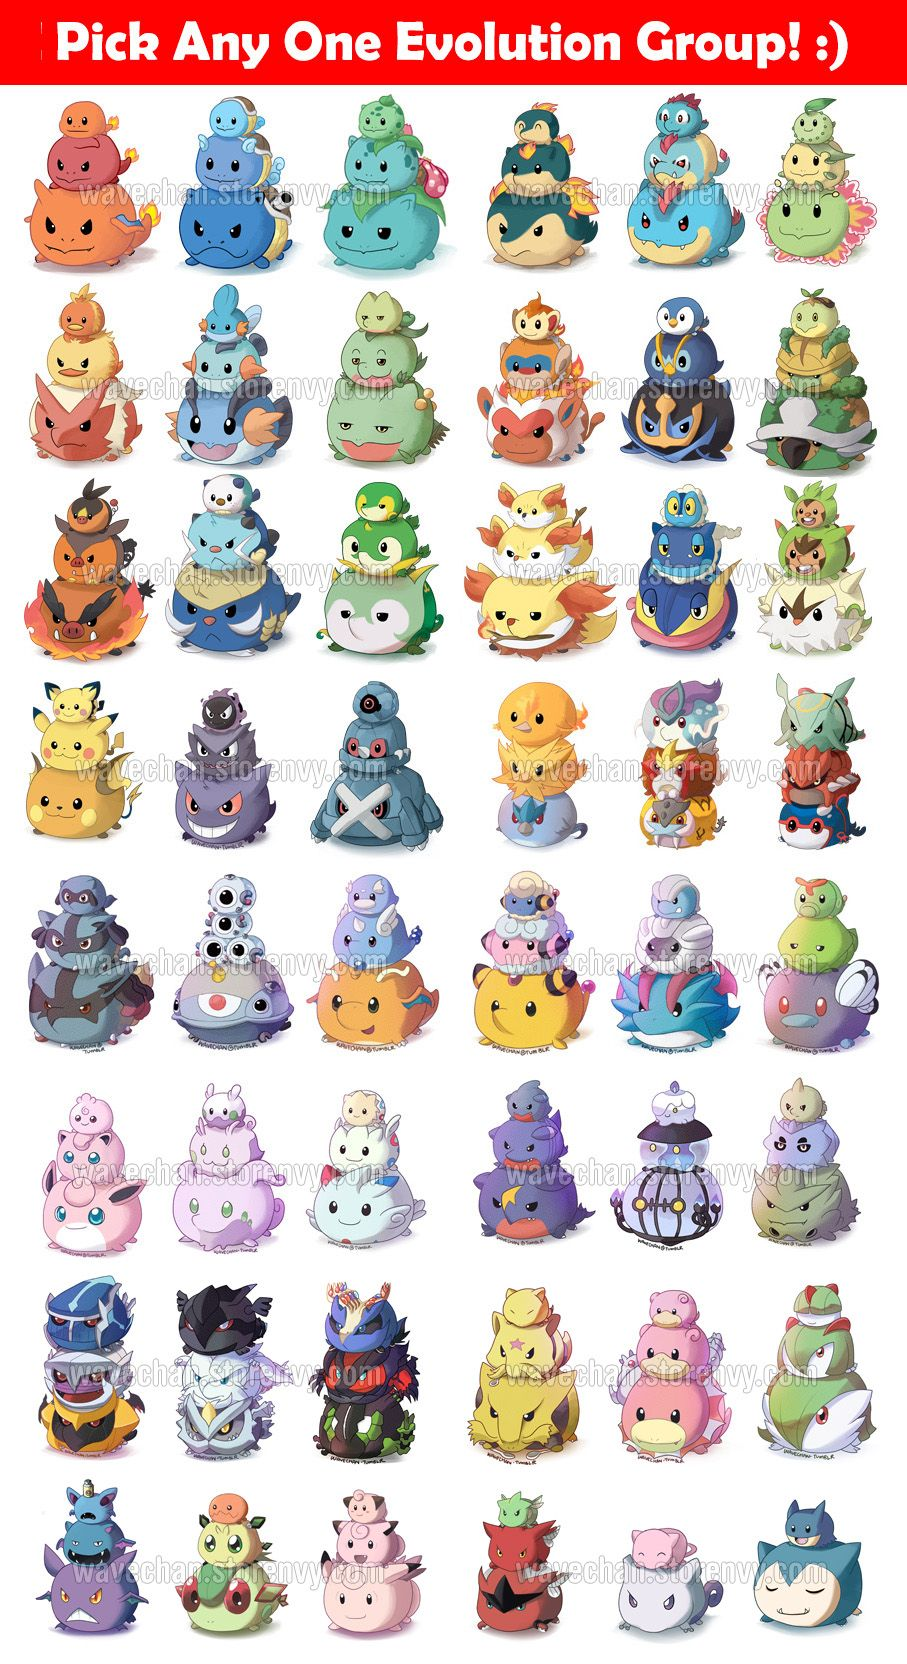 Pin by Jose Garcia on Crochet   Pinterest   Pokémon, Cute pokemon ...